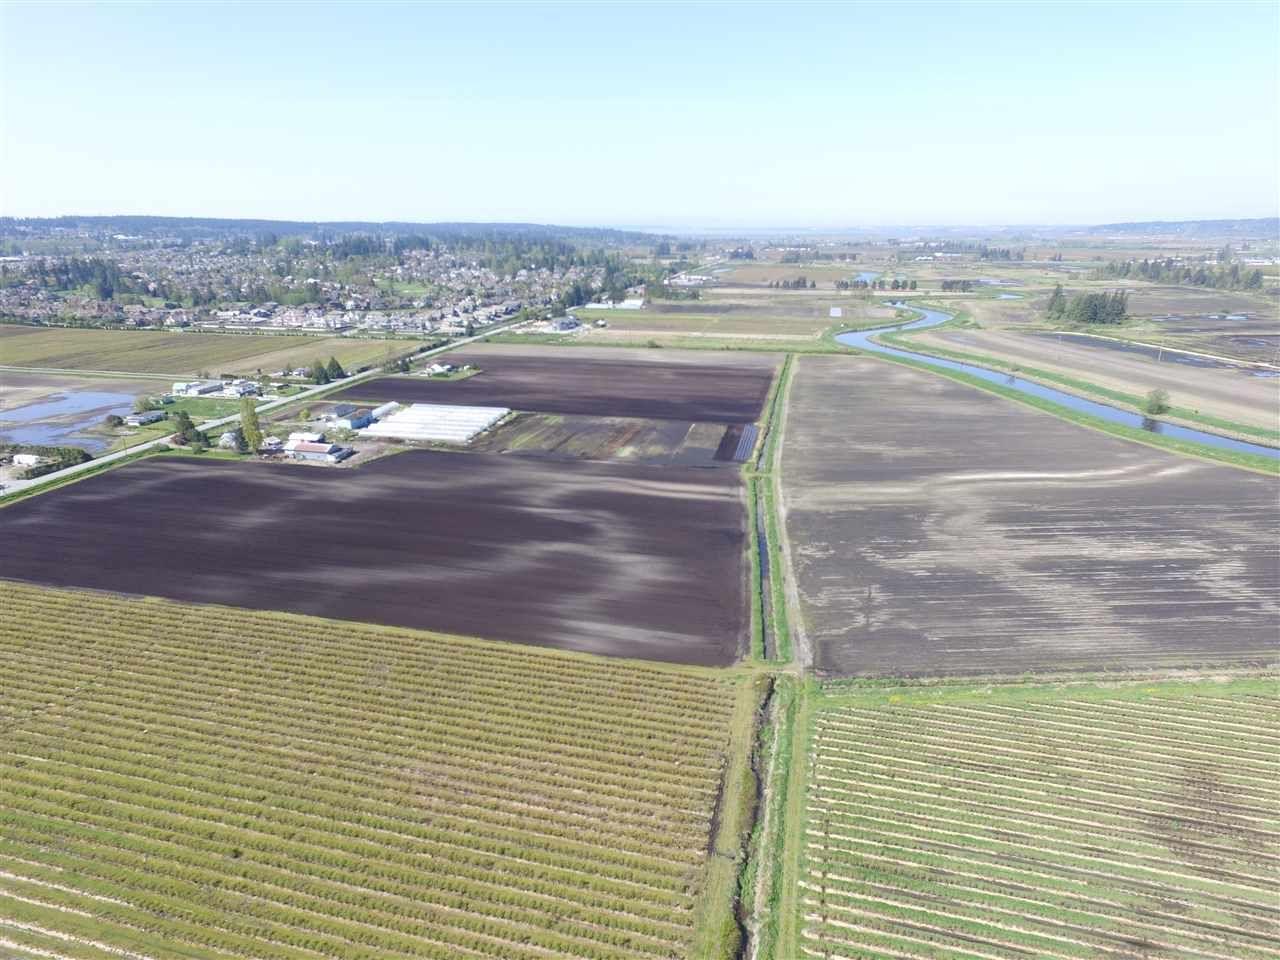 Photo 6: Photos: 16271 40 Avenue in Surrey: Serpentine Land for sale (Cloverdale)  : MLS®# R2335945